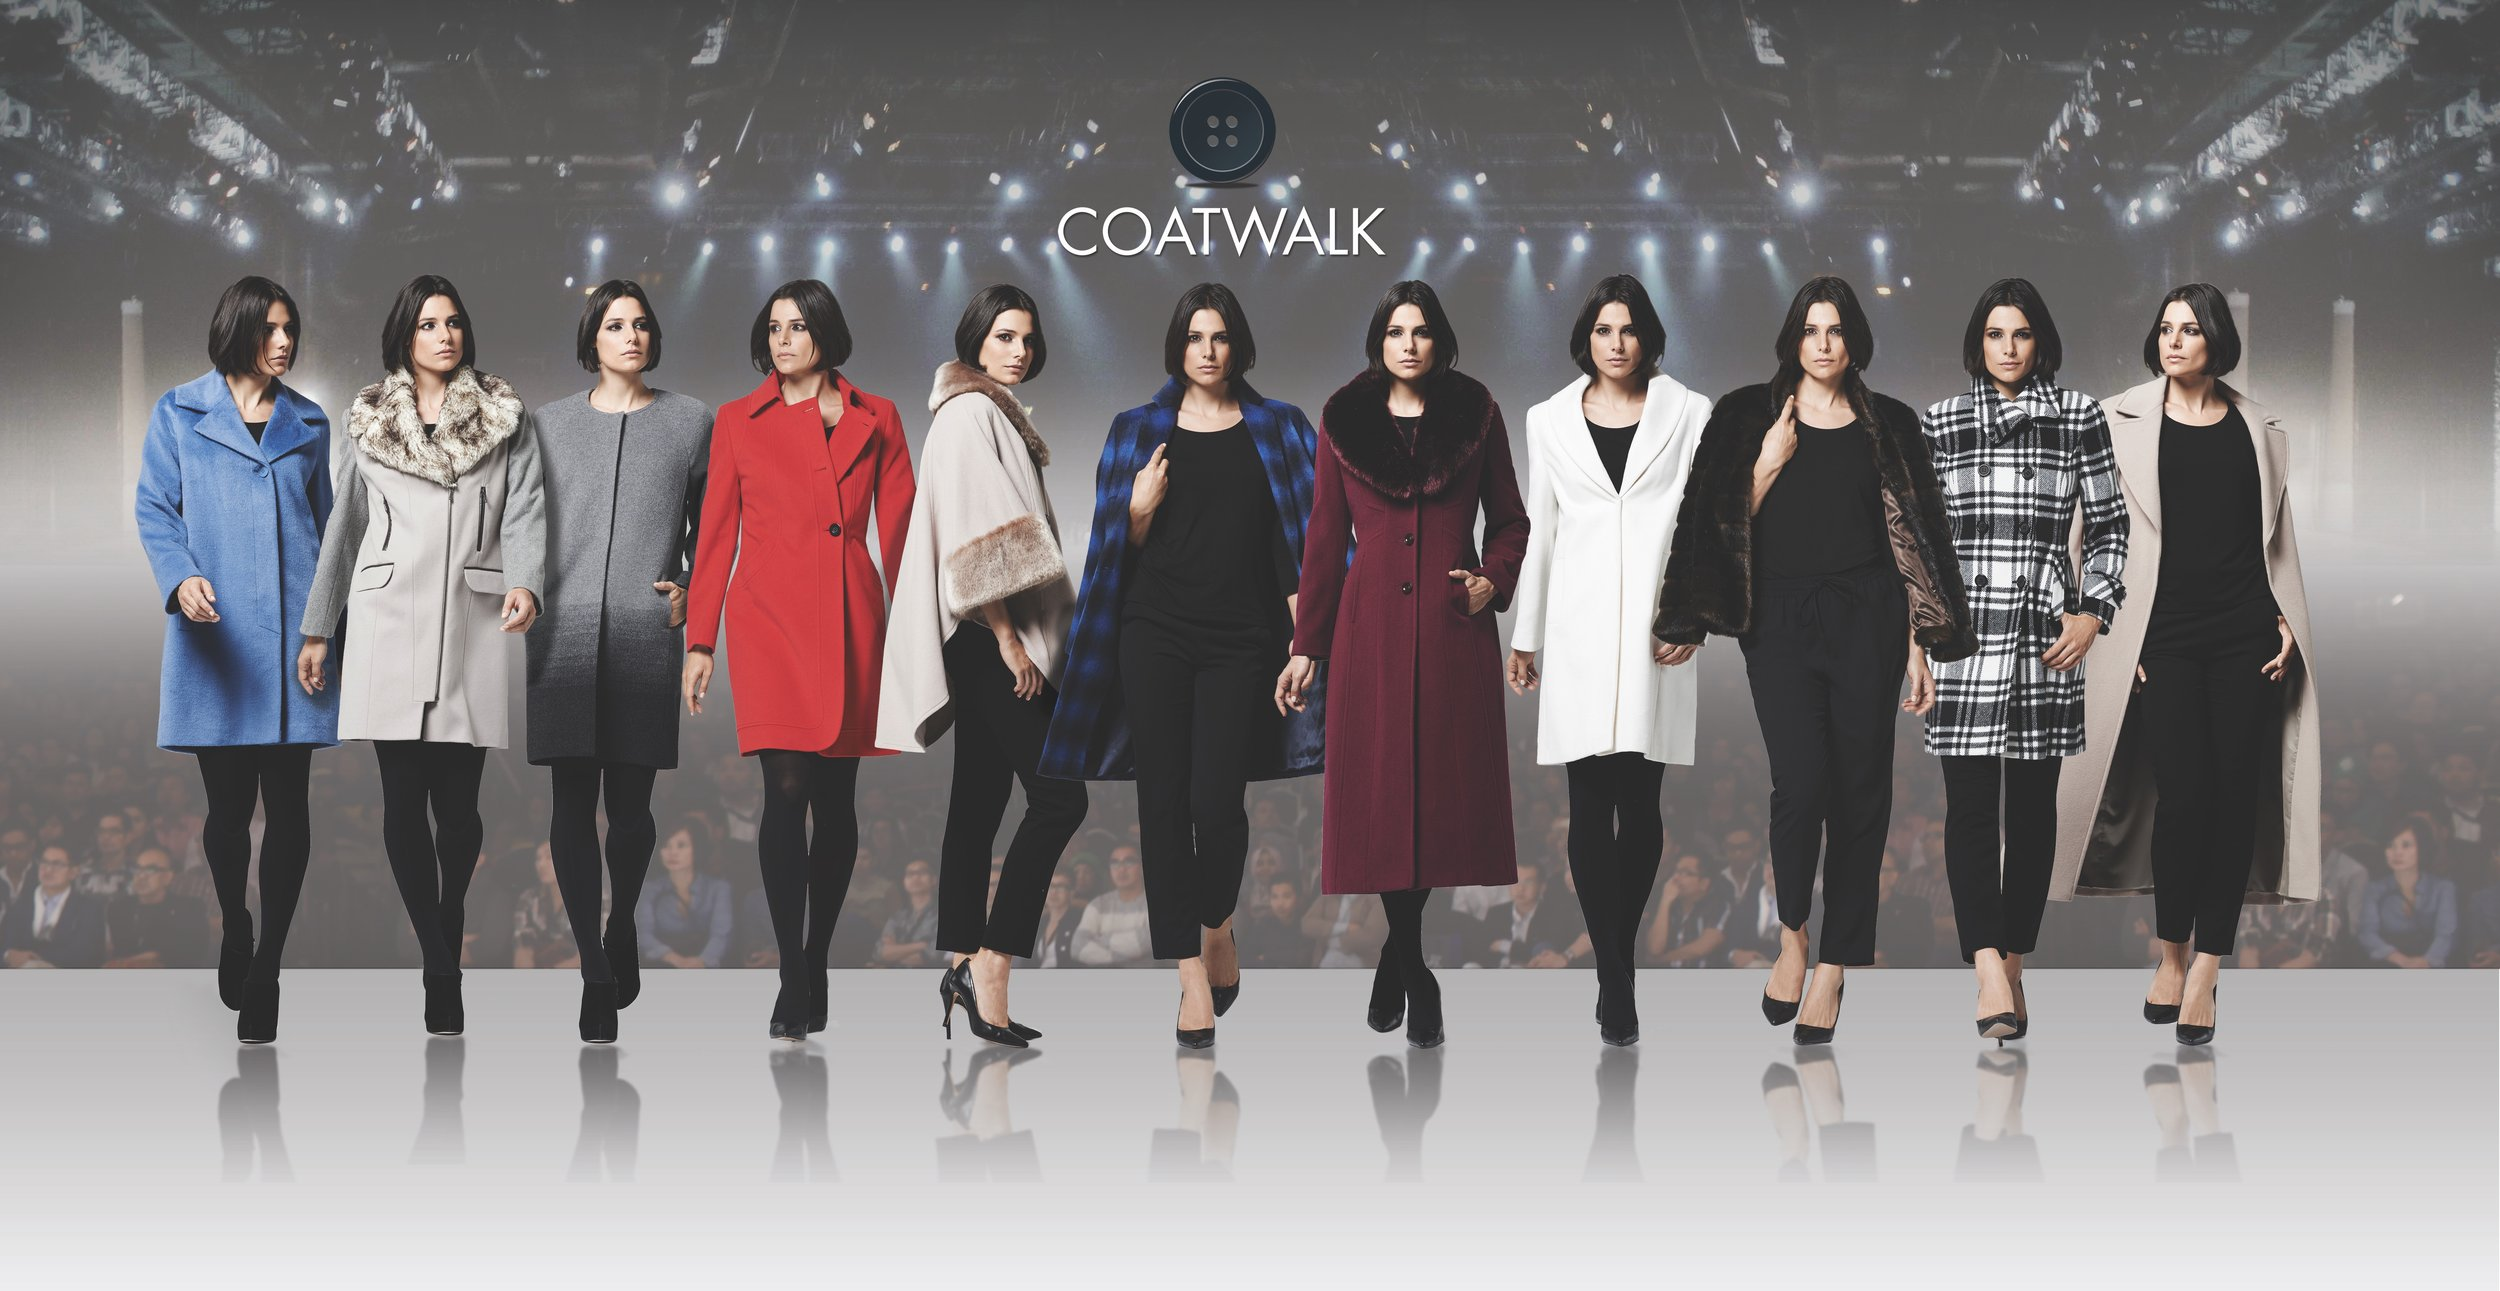 coatwalk long.jpg